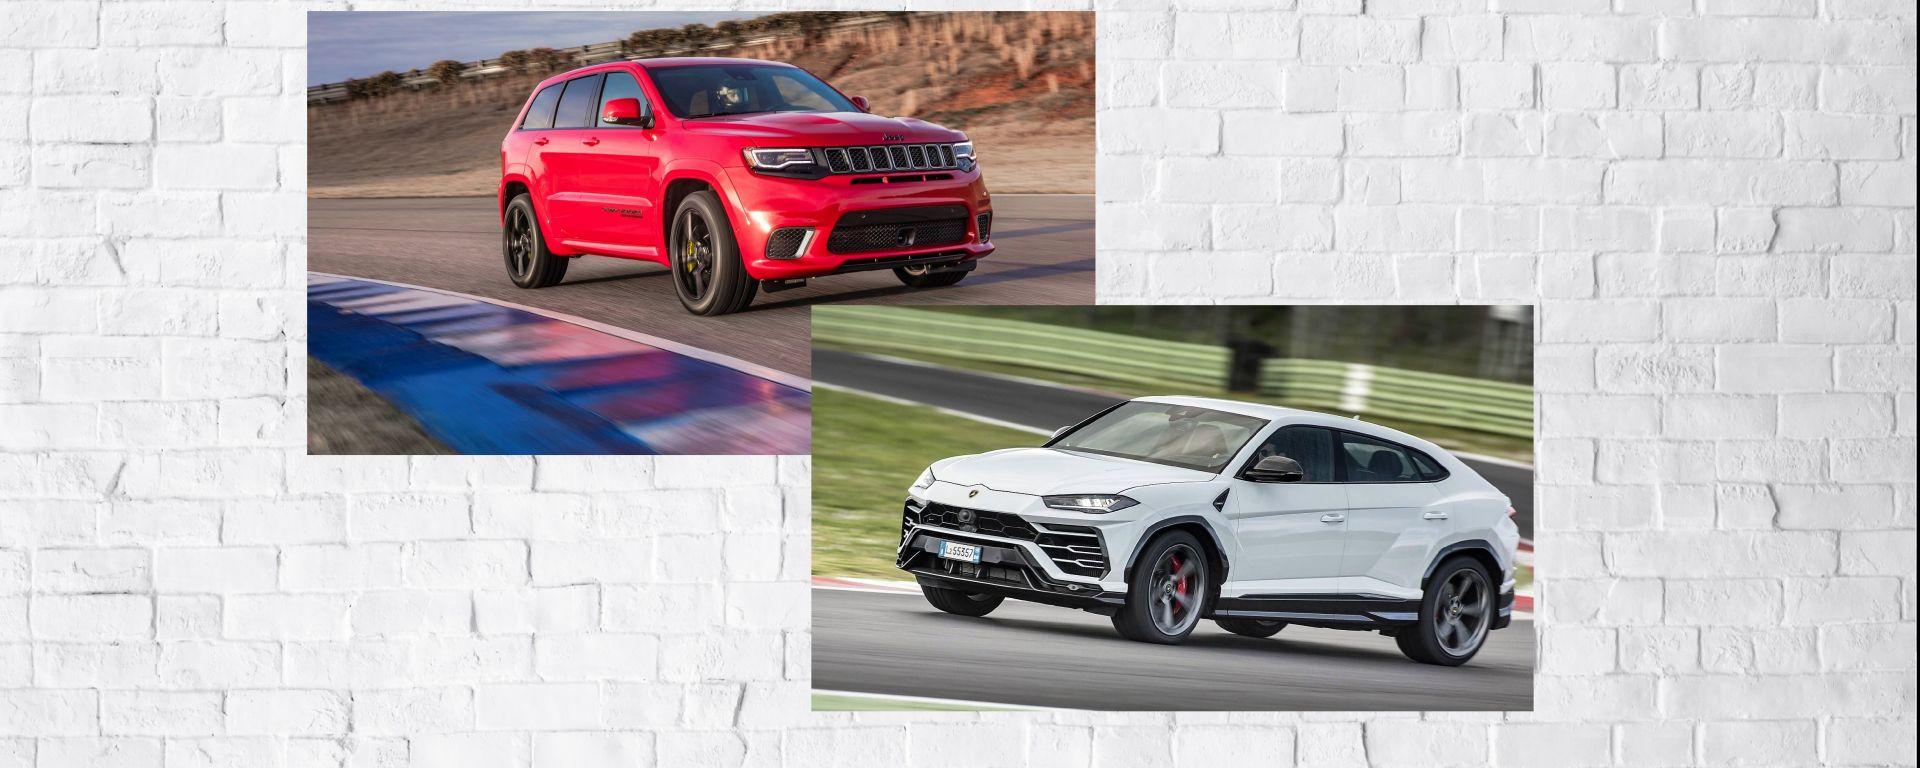 Jeep Trackhawk vs Lamborghini Urus